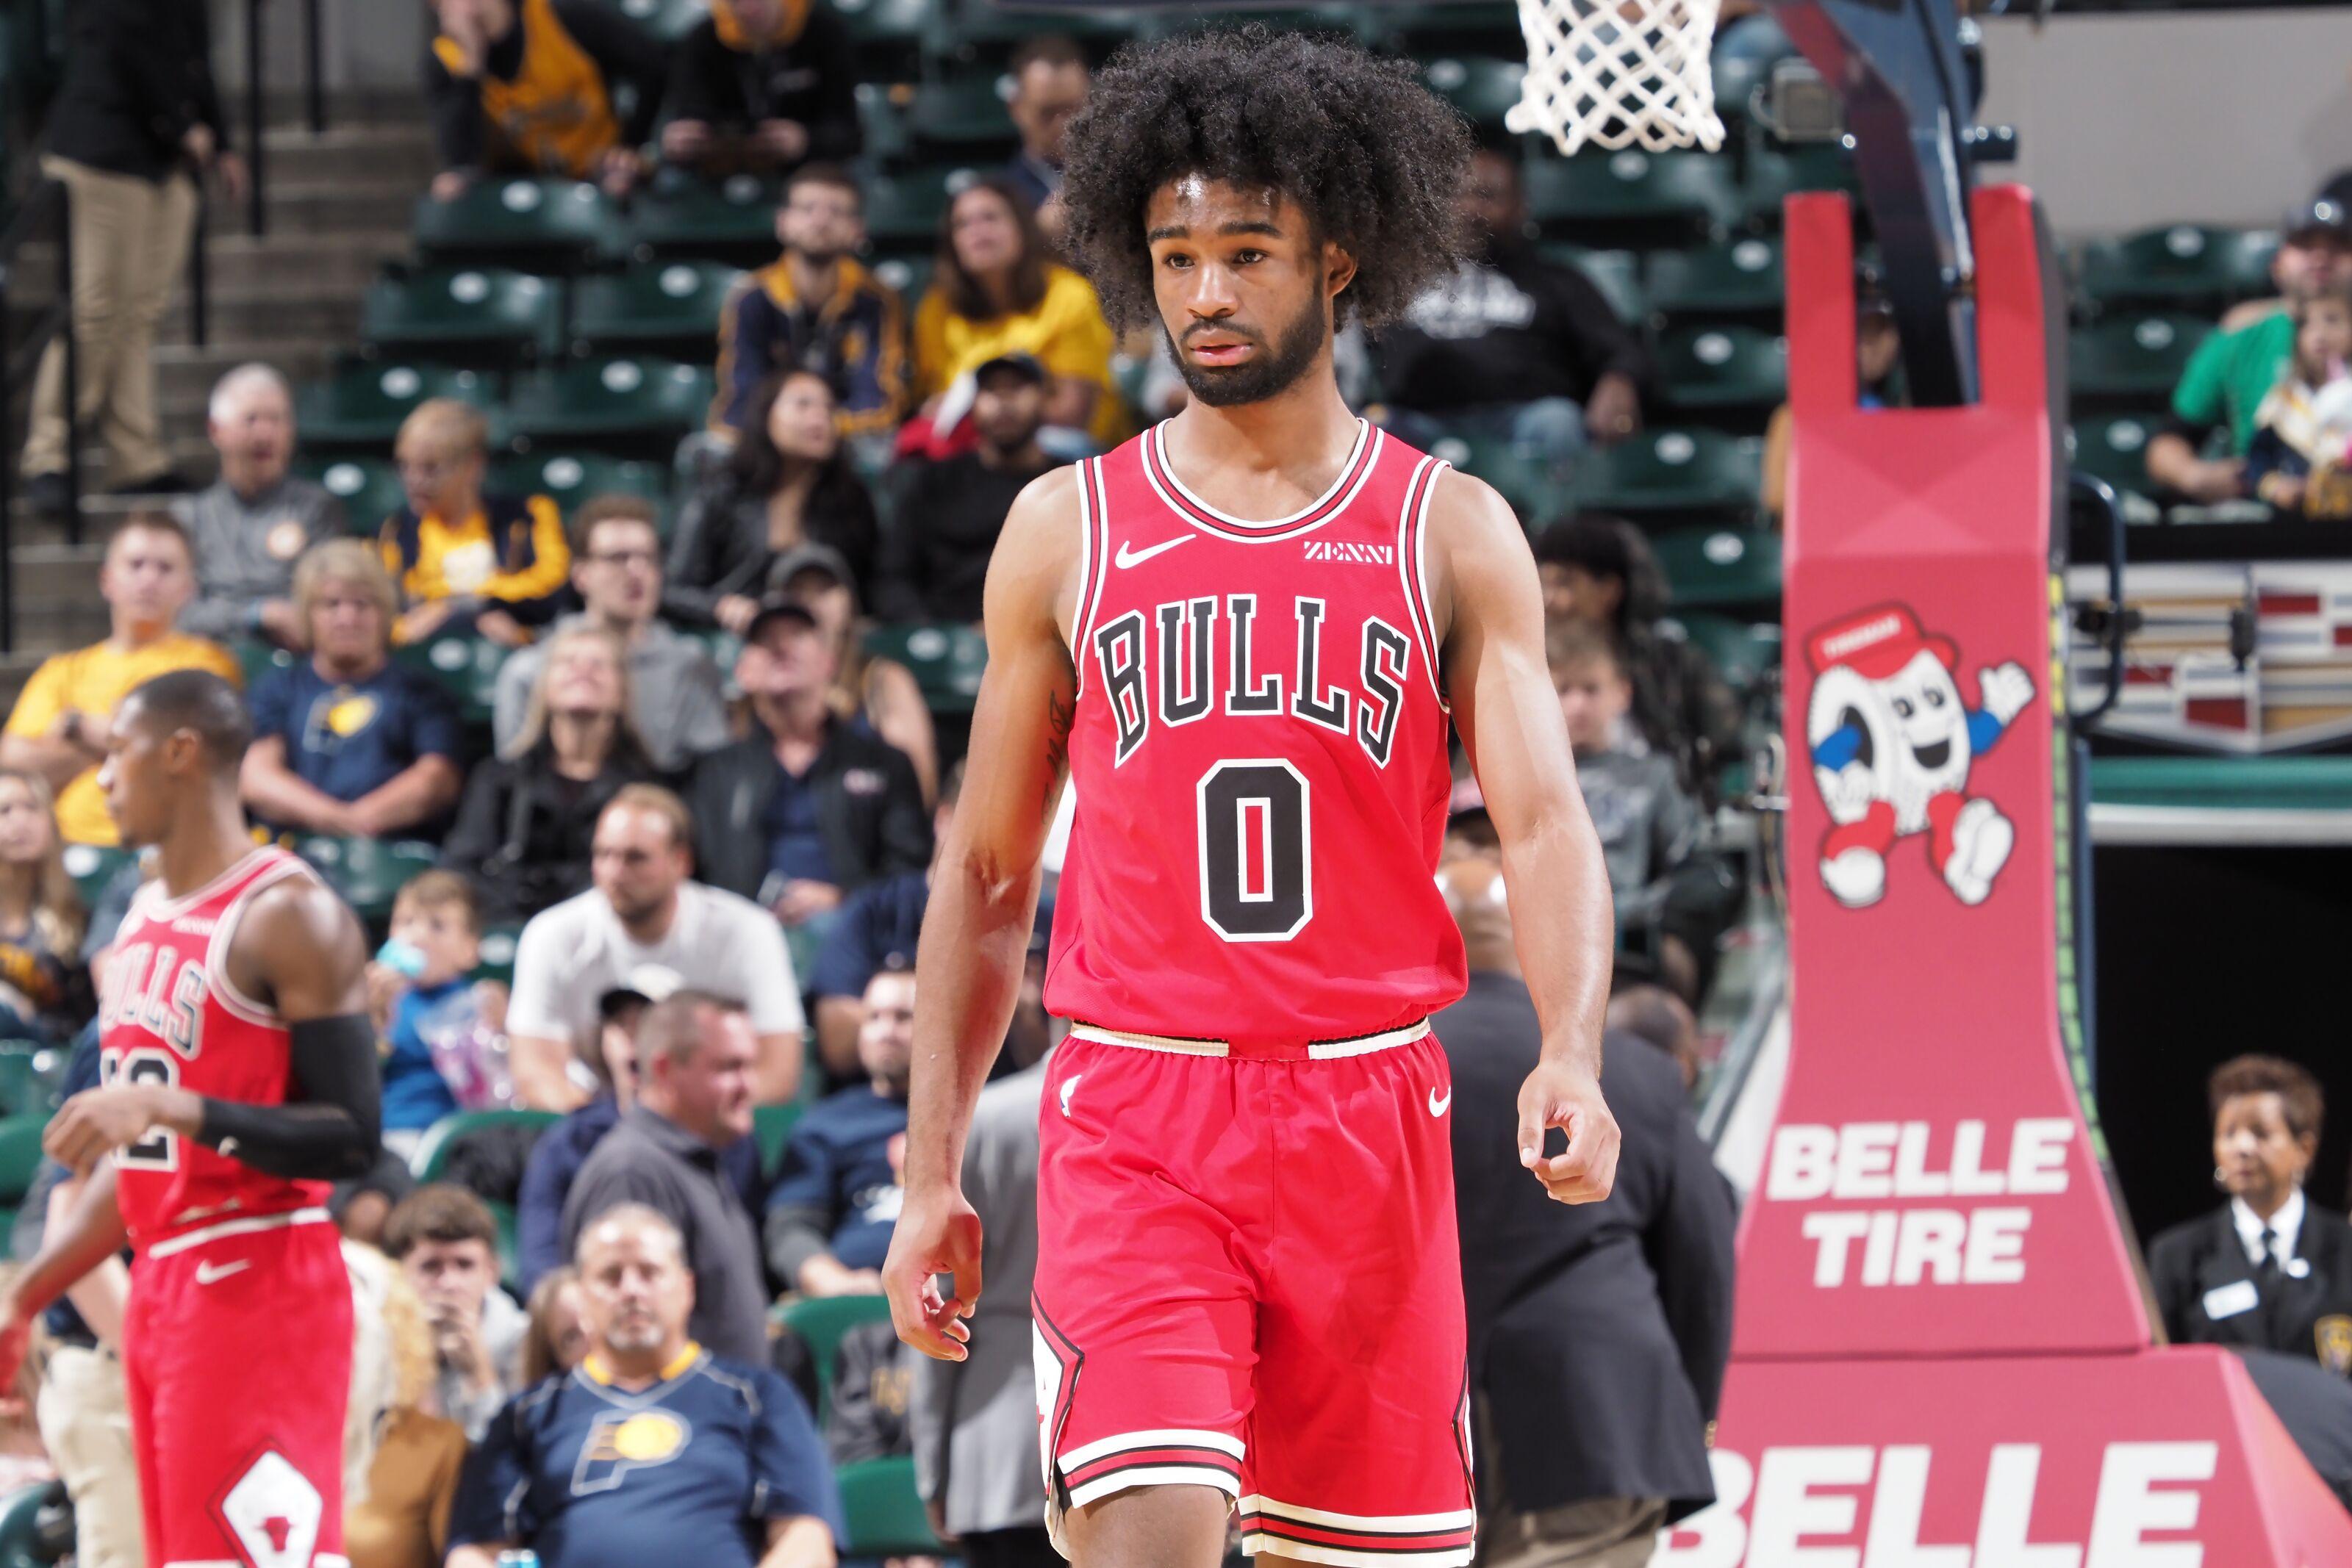 Chicago Bulls: Satoransky winning the PG battle, White still the future